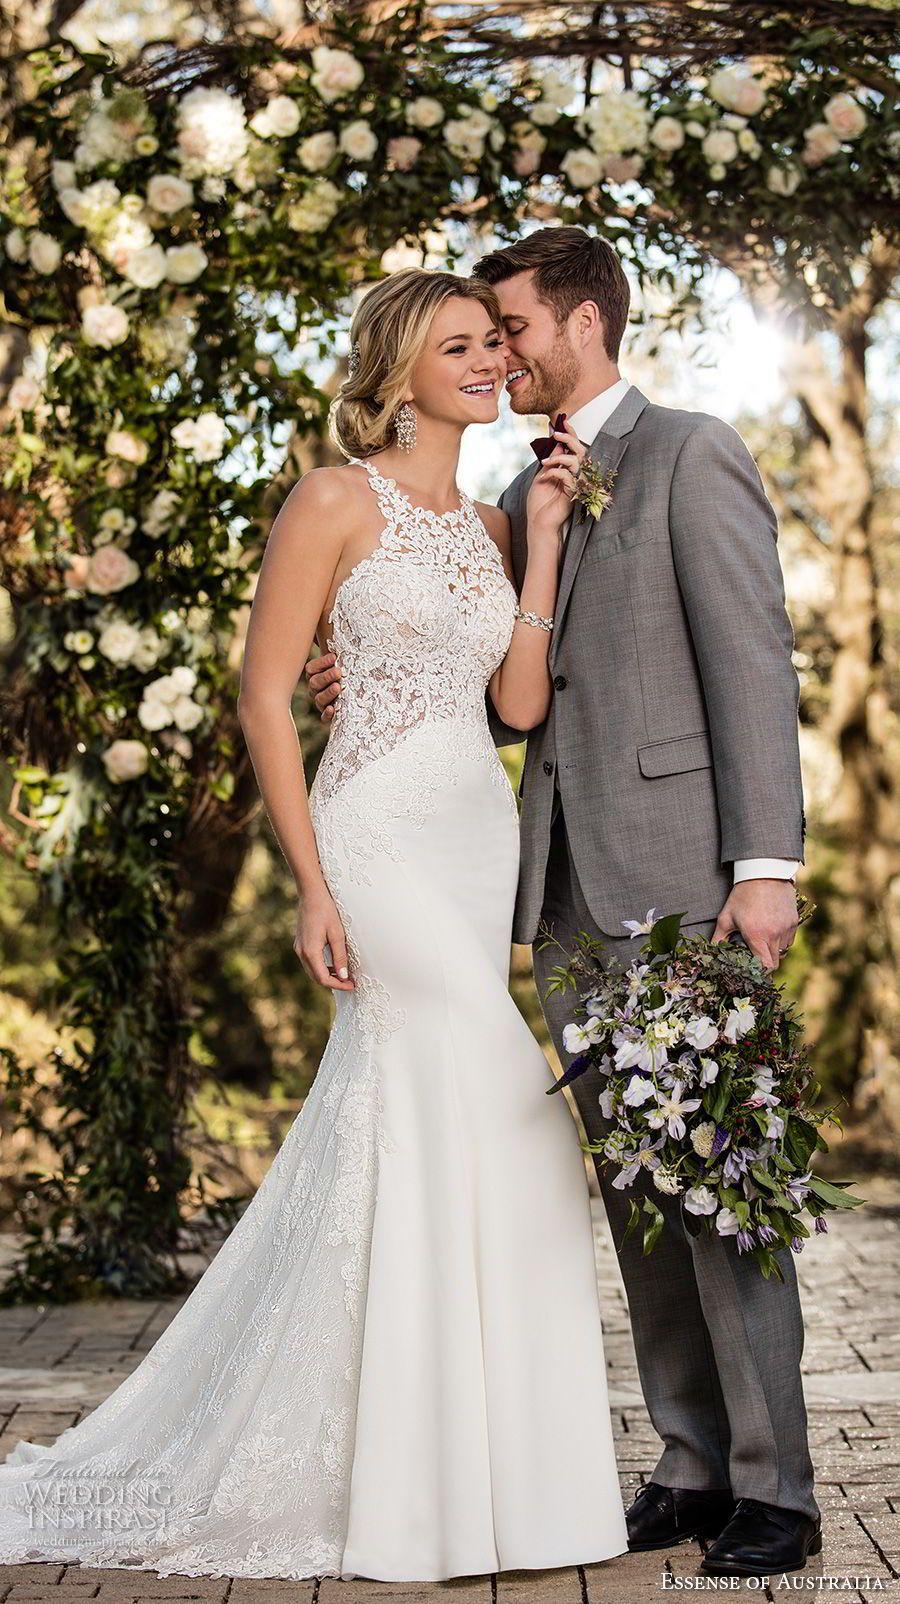 Elegant mermaid wedding dresses  Essense of Australia Fall  Wedding Dresses  Pinterest  Mermaid